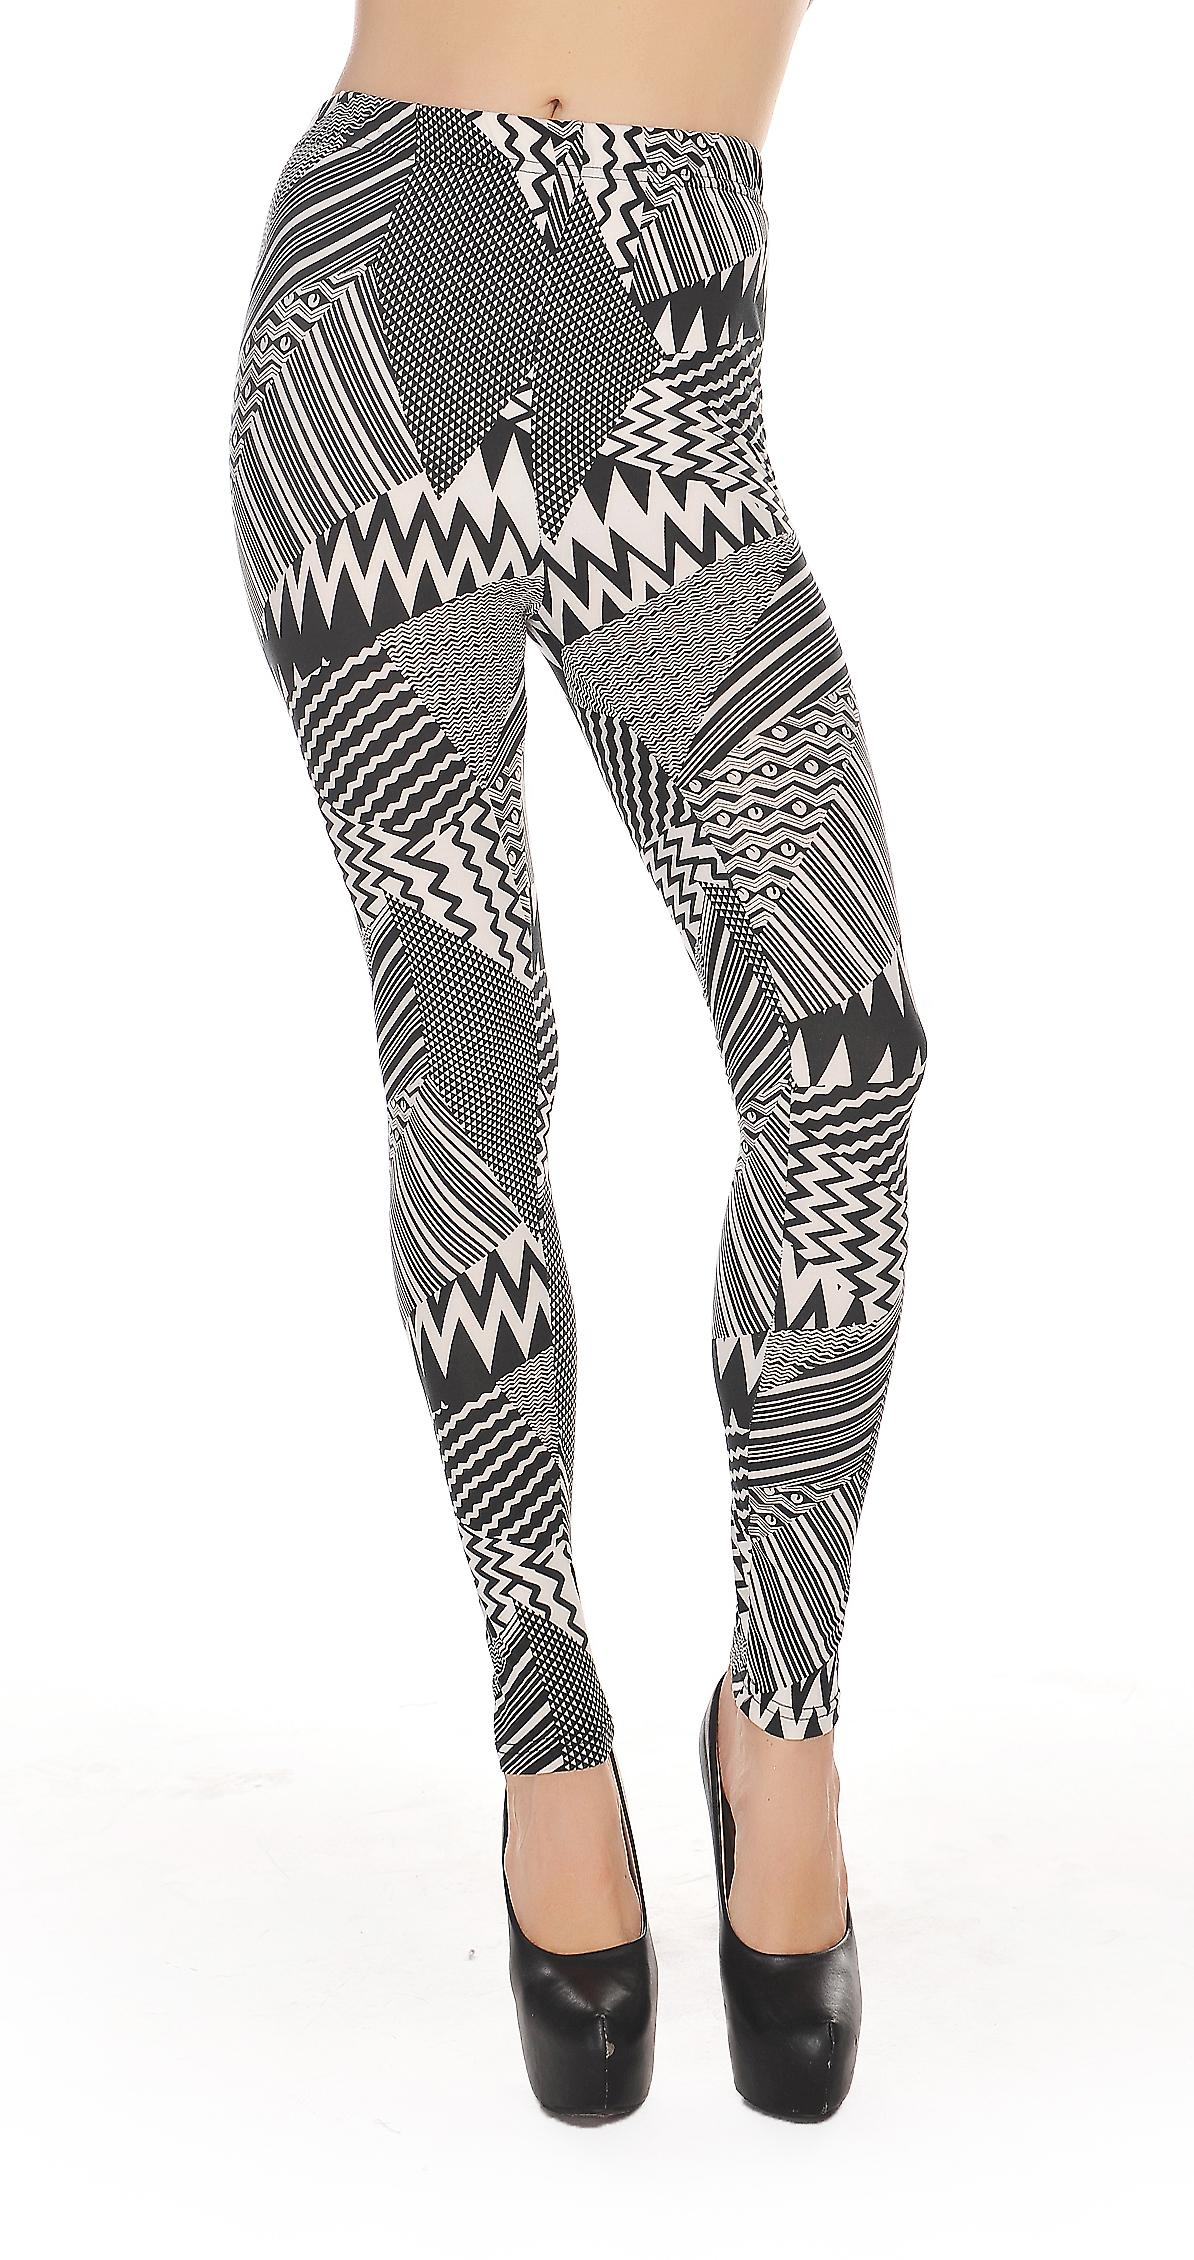 Waooh - Mode - Legging motif rayures psychédéliques